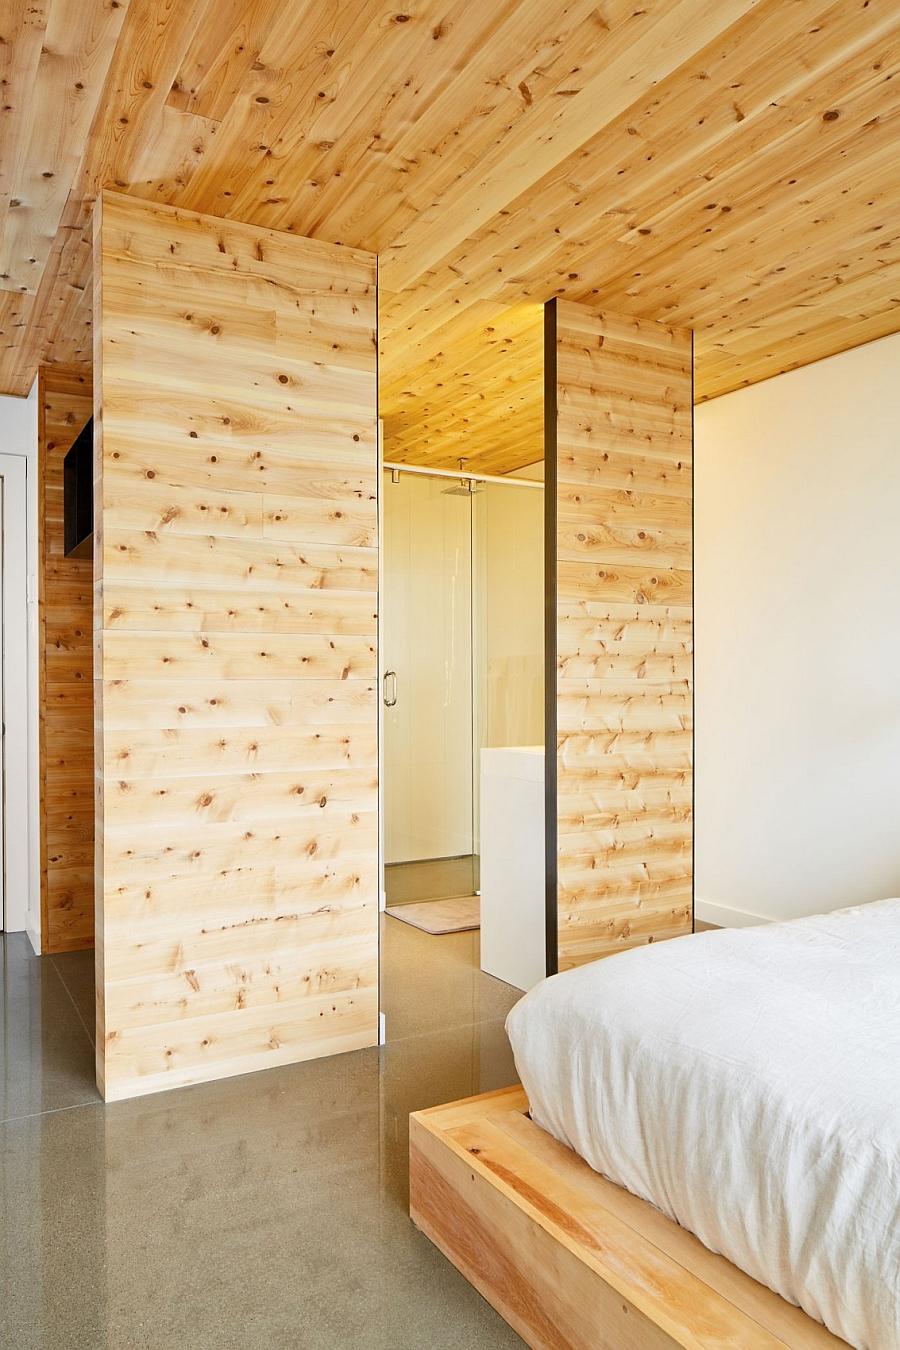 Bedroom walls clad in wood